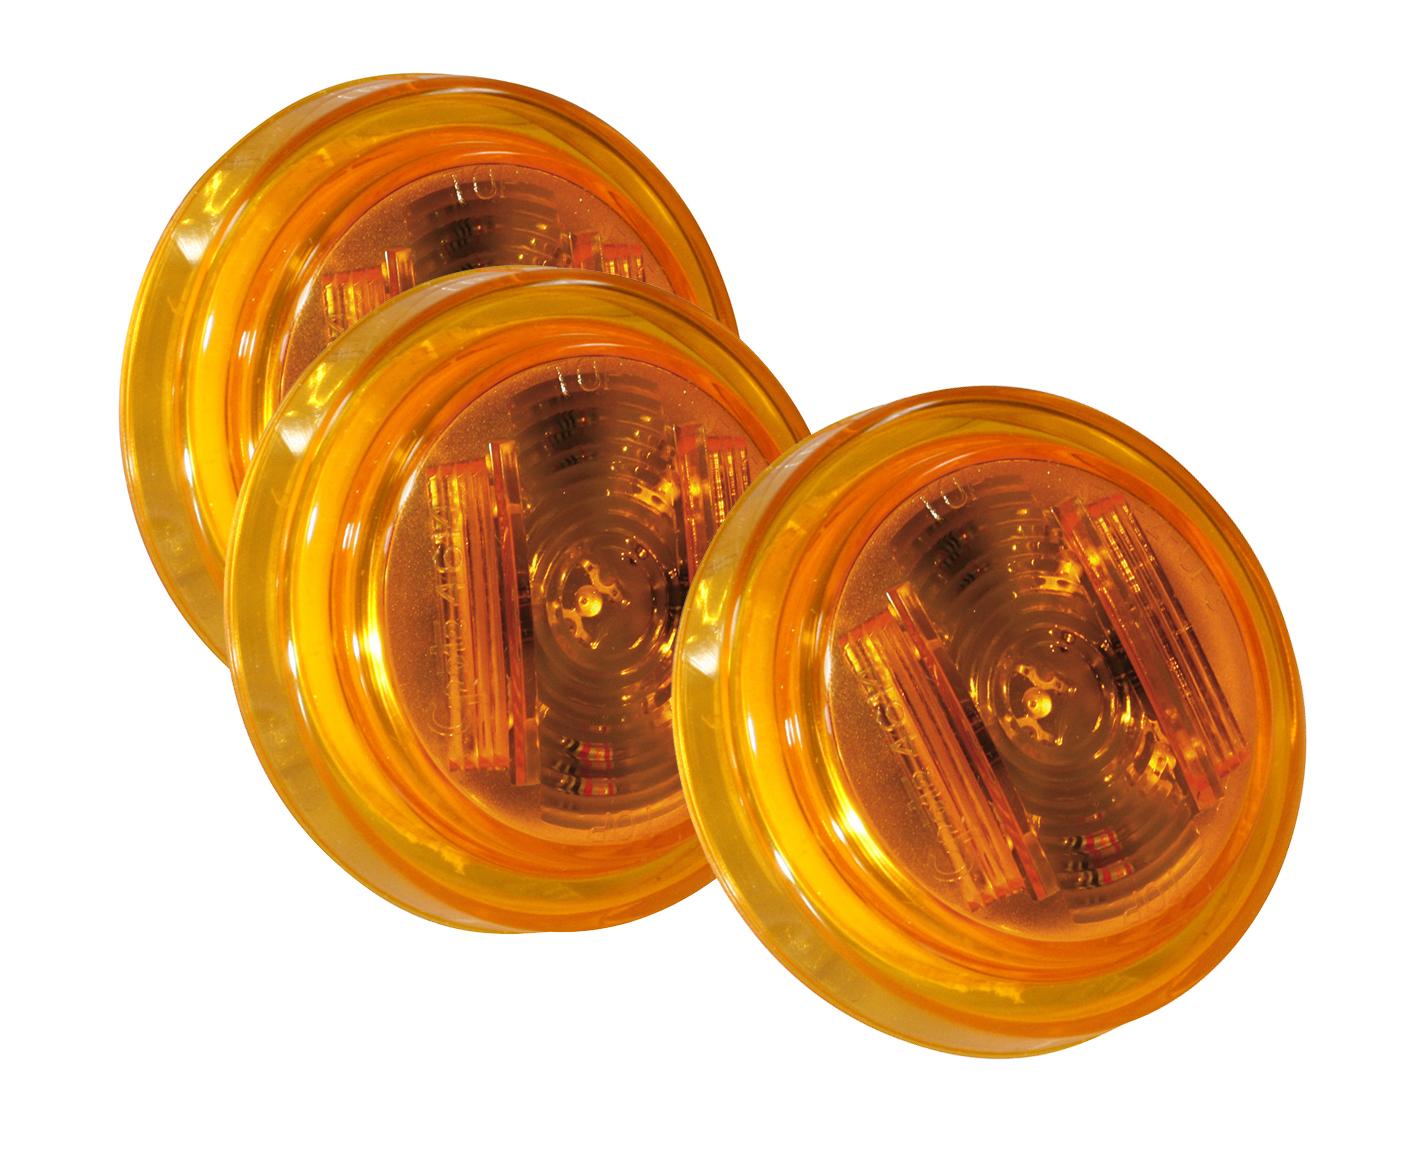 46143-3 – SuperNova® 2 1/2″ Clearance Marker LED Light, PC Rated, Yellow, Bulk Pack